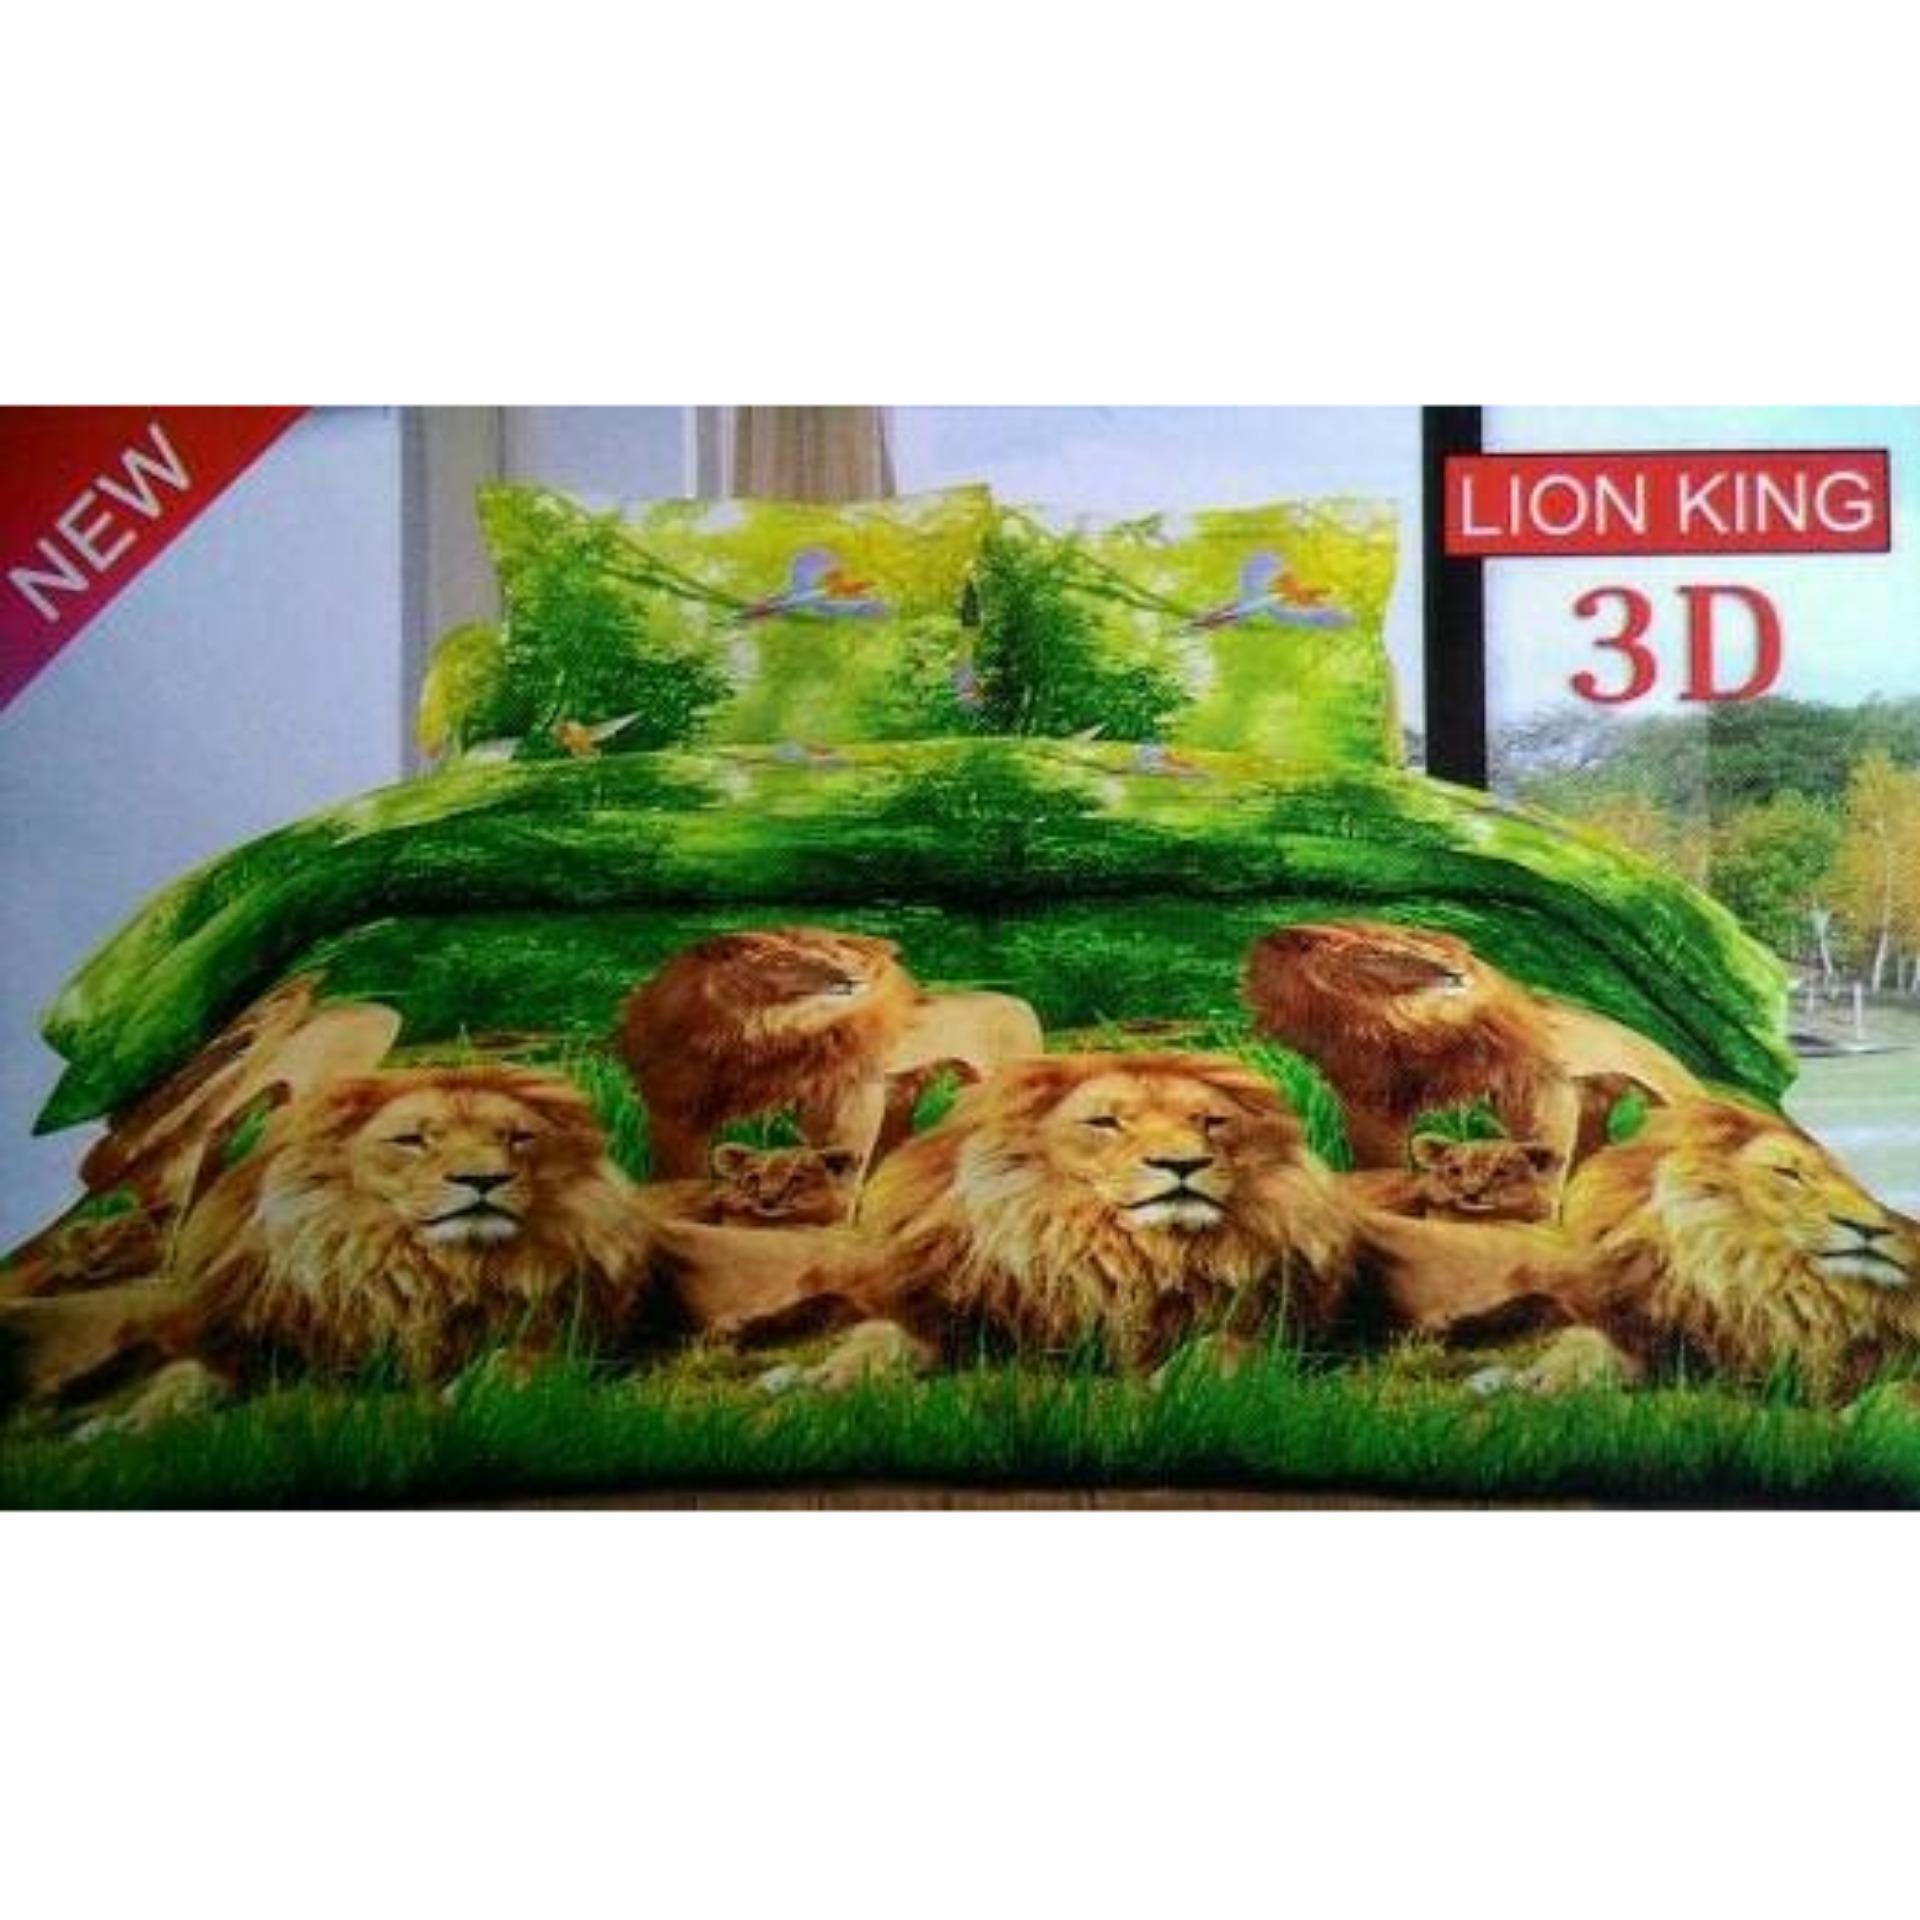 Kelebihan Terbaru Sprei Bonita Romantic No 1 King 180 B4 Spray Sprai Backpack Pria Raindoz Bbr611 Lion No1